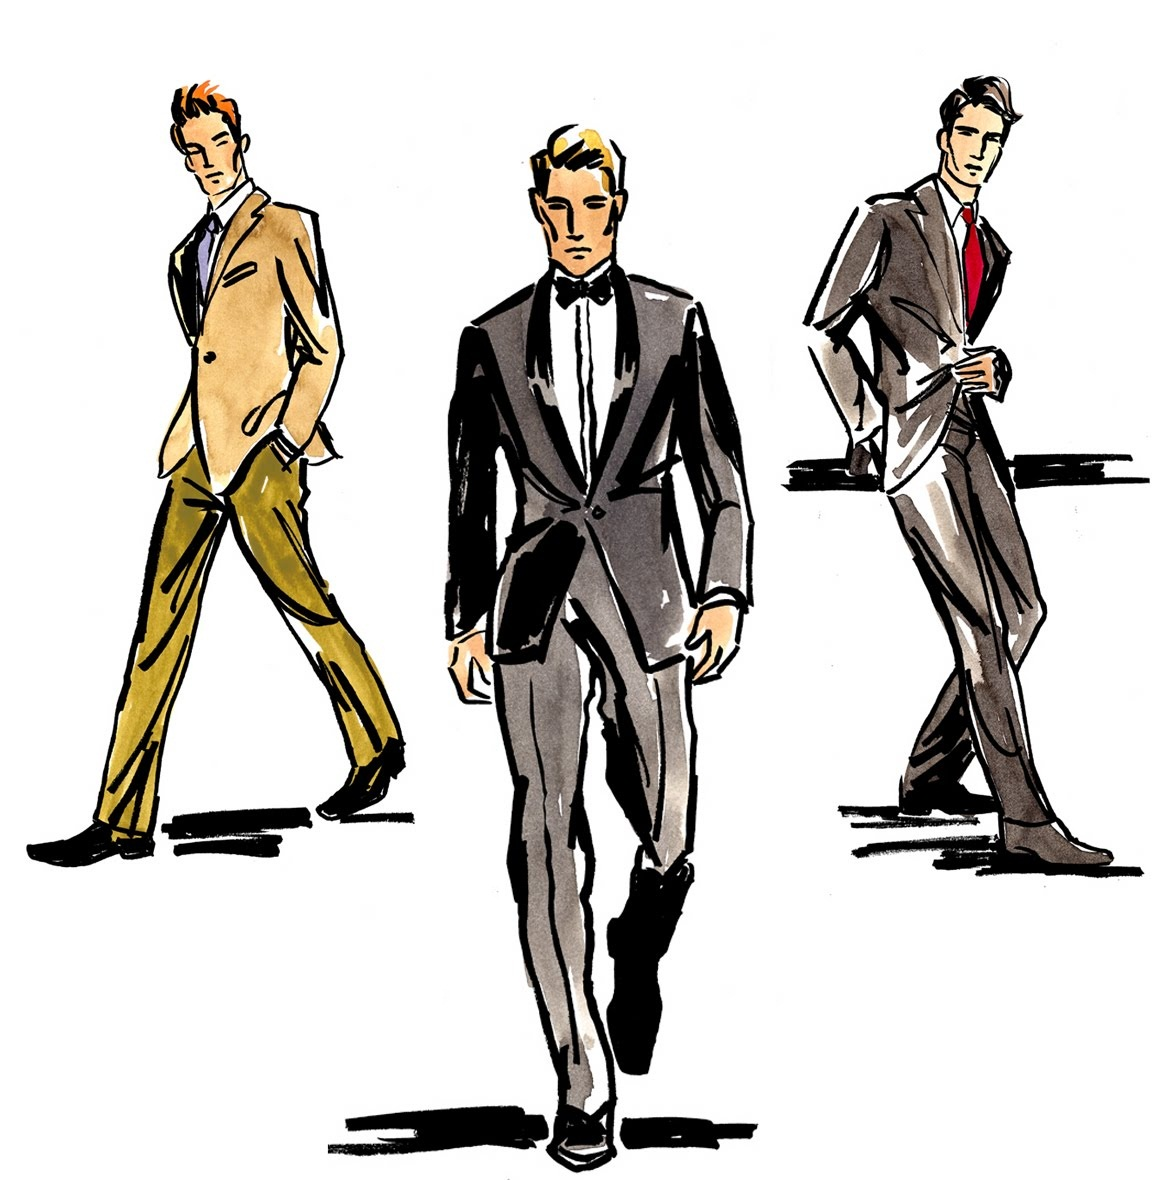 Drawn suit sketch man Fashion de Find Google imágenes